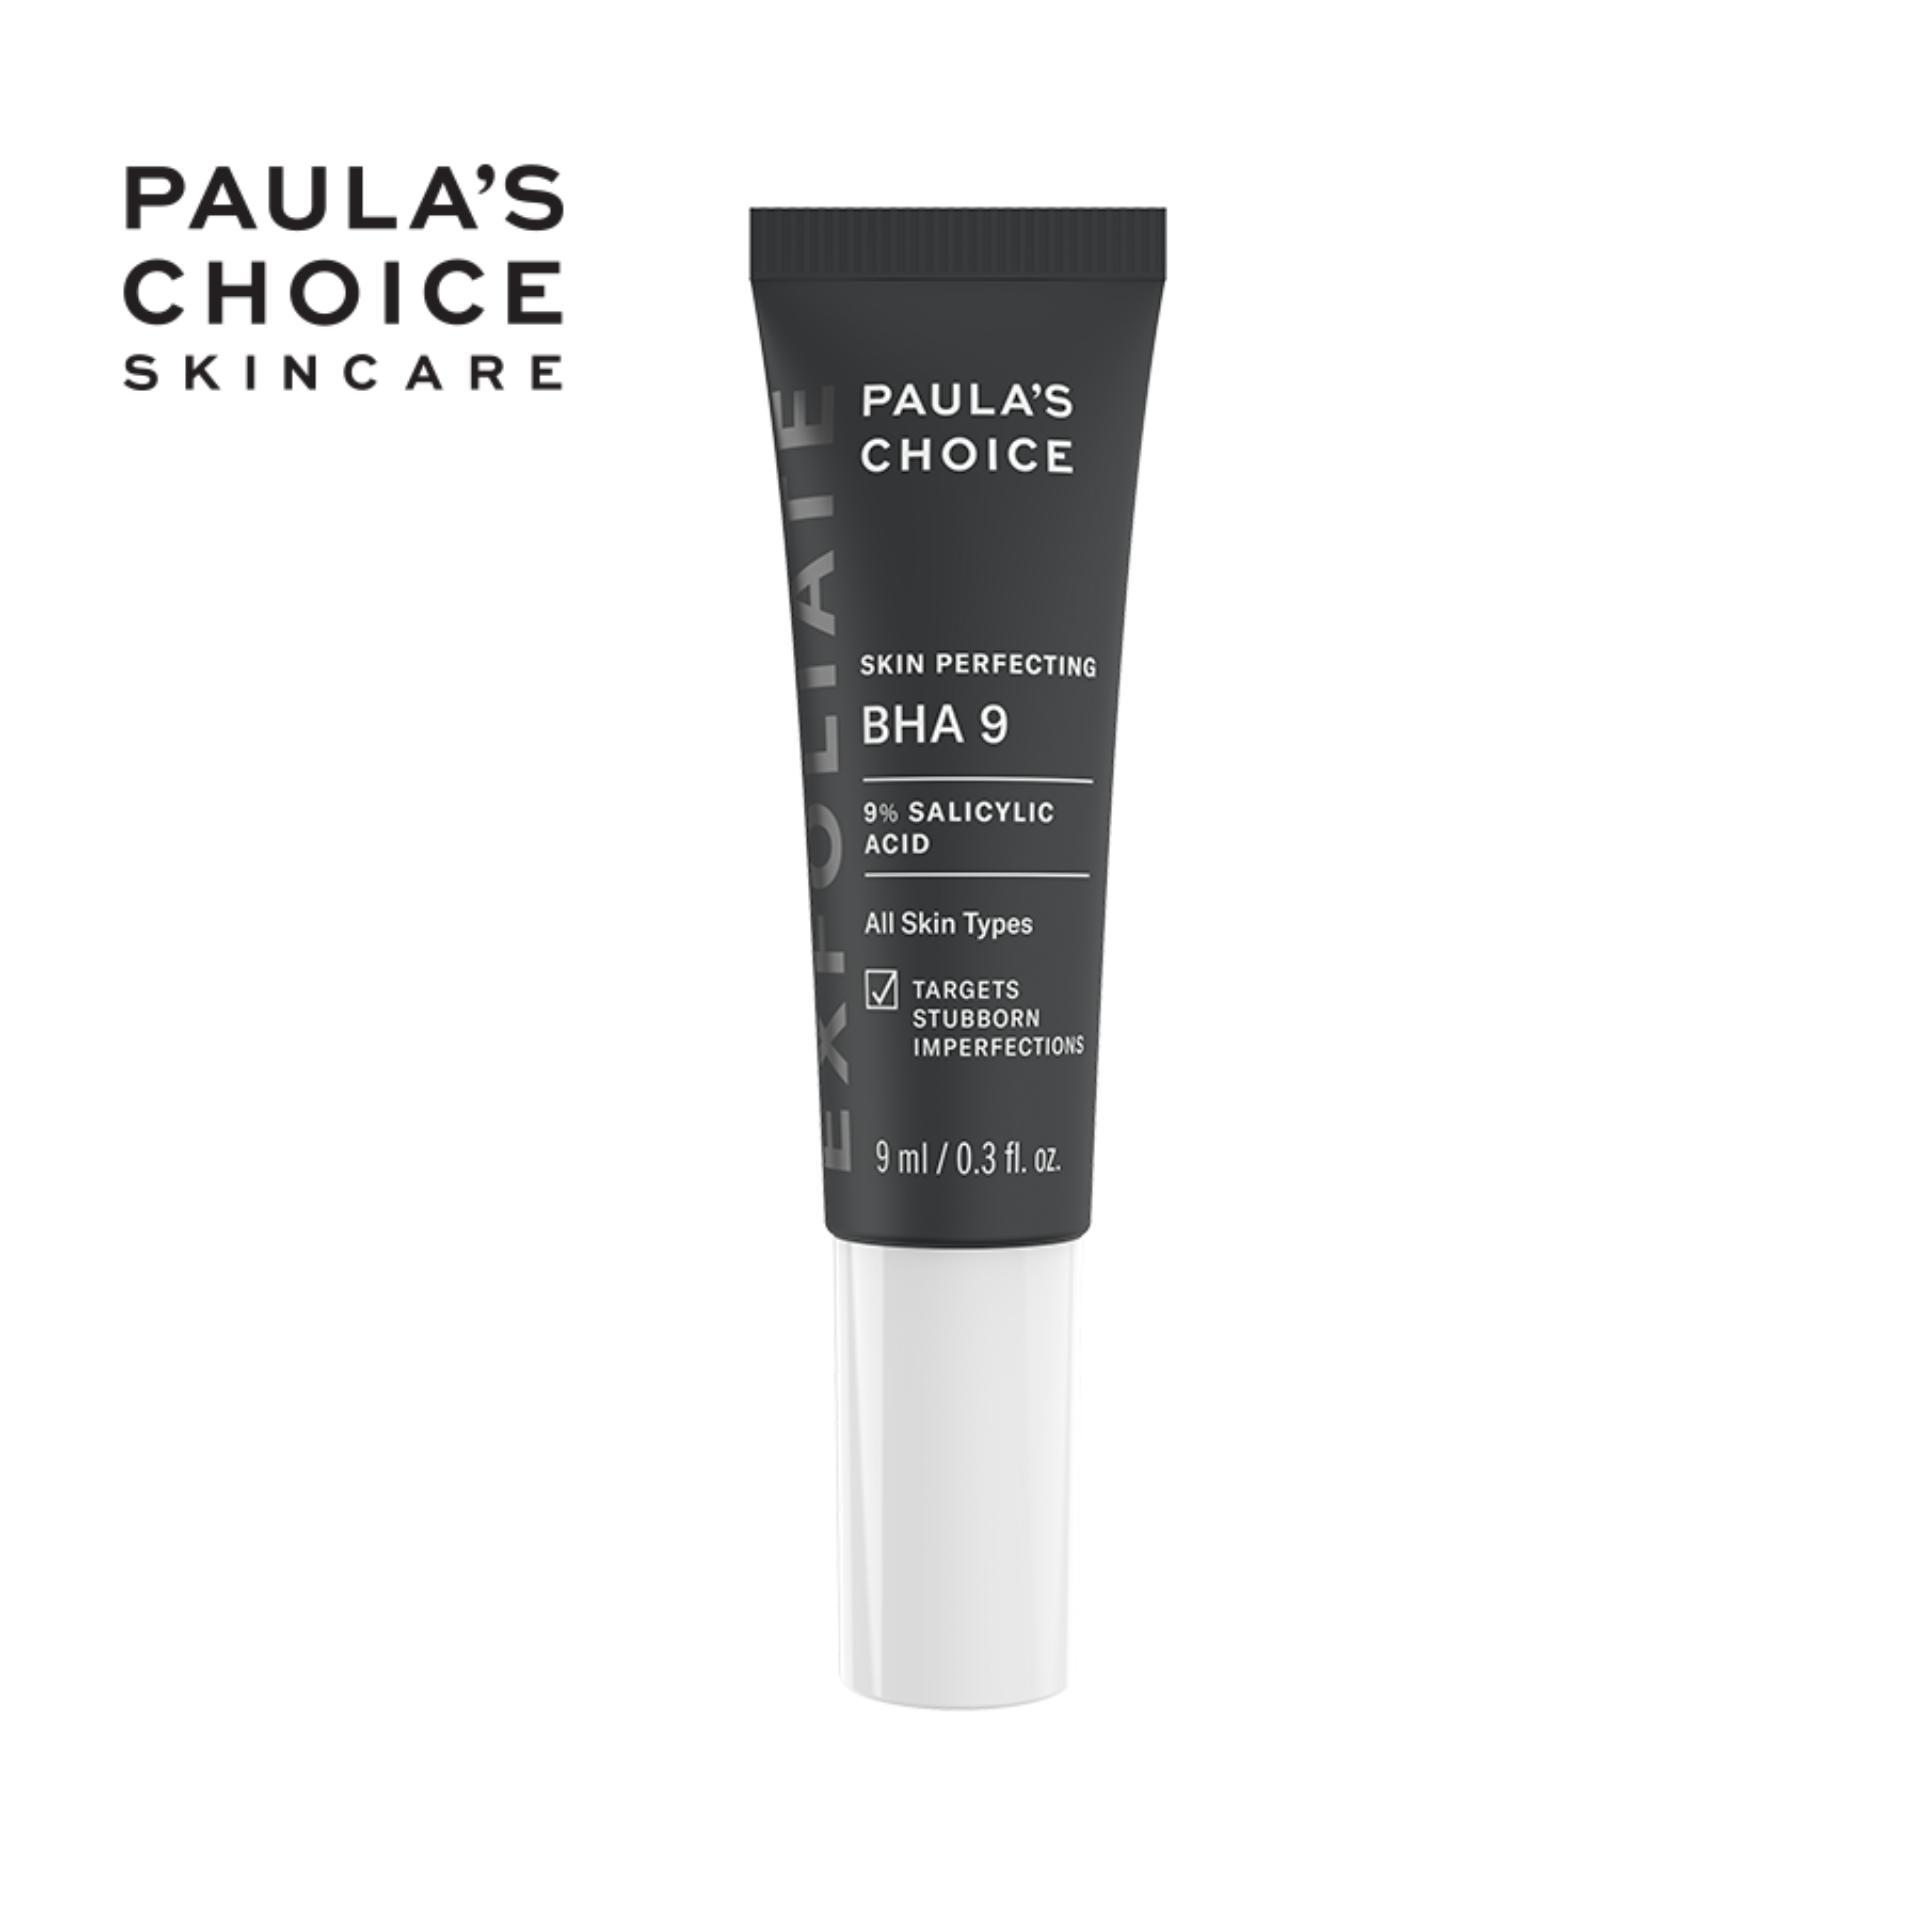 Tinh chất giảm thiểu mụn cao cấp 9% BHA Paula's Choice Resist BHA 9 7730 cao cấp